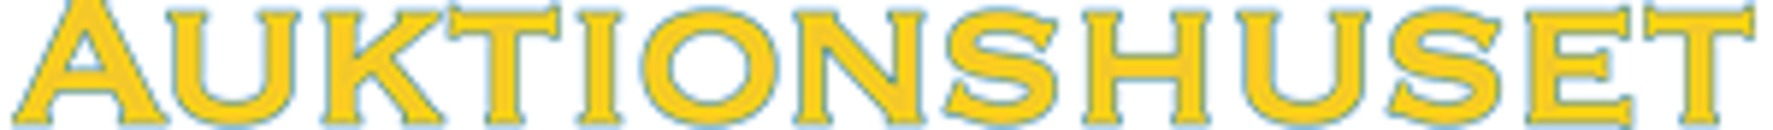 Auktionshuset i Örebro AB logo